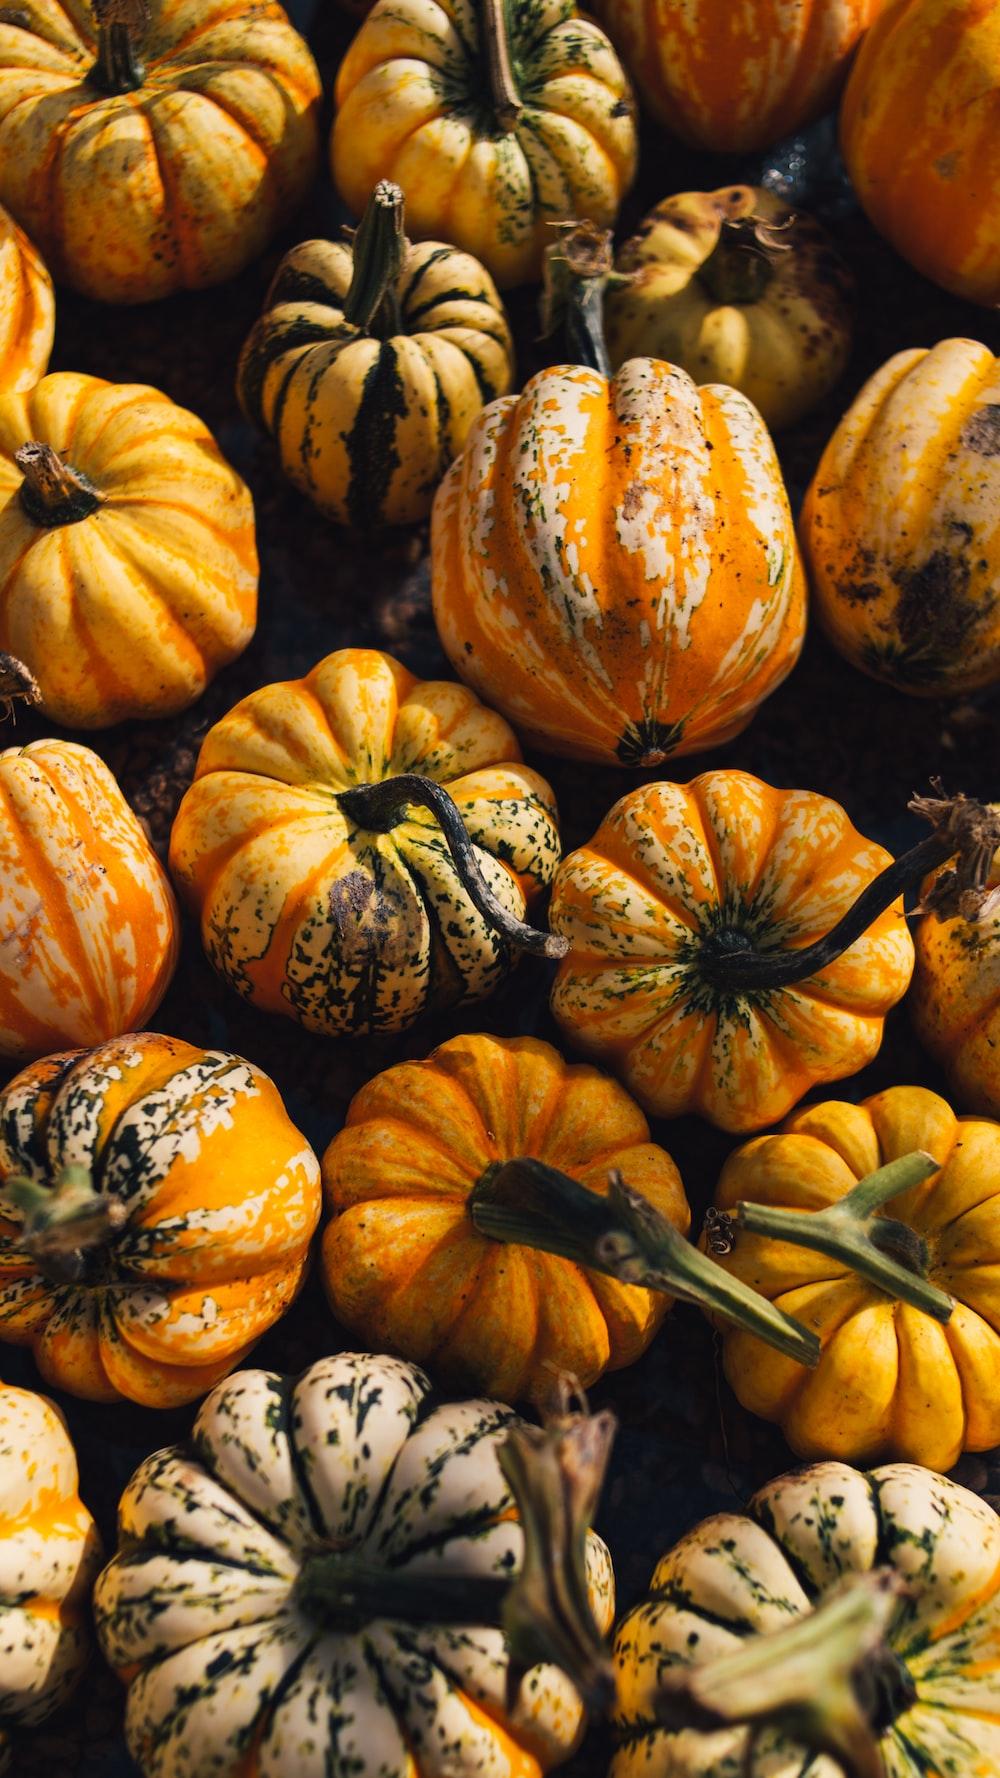 yellow and orange pumpkins